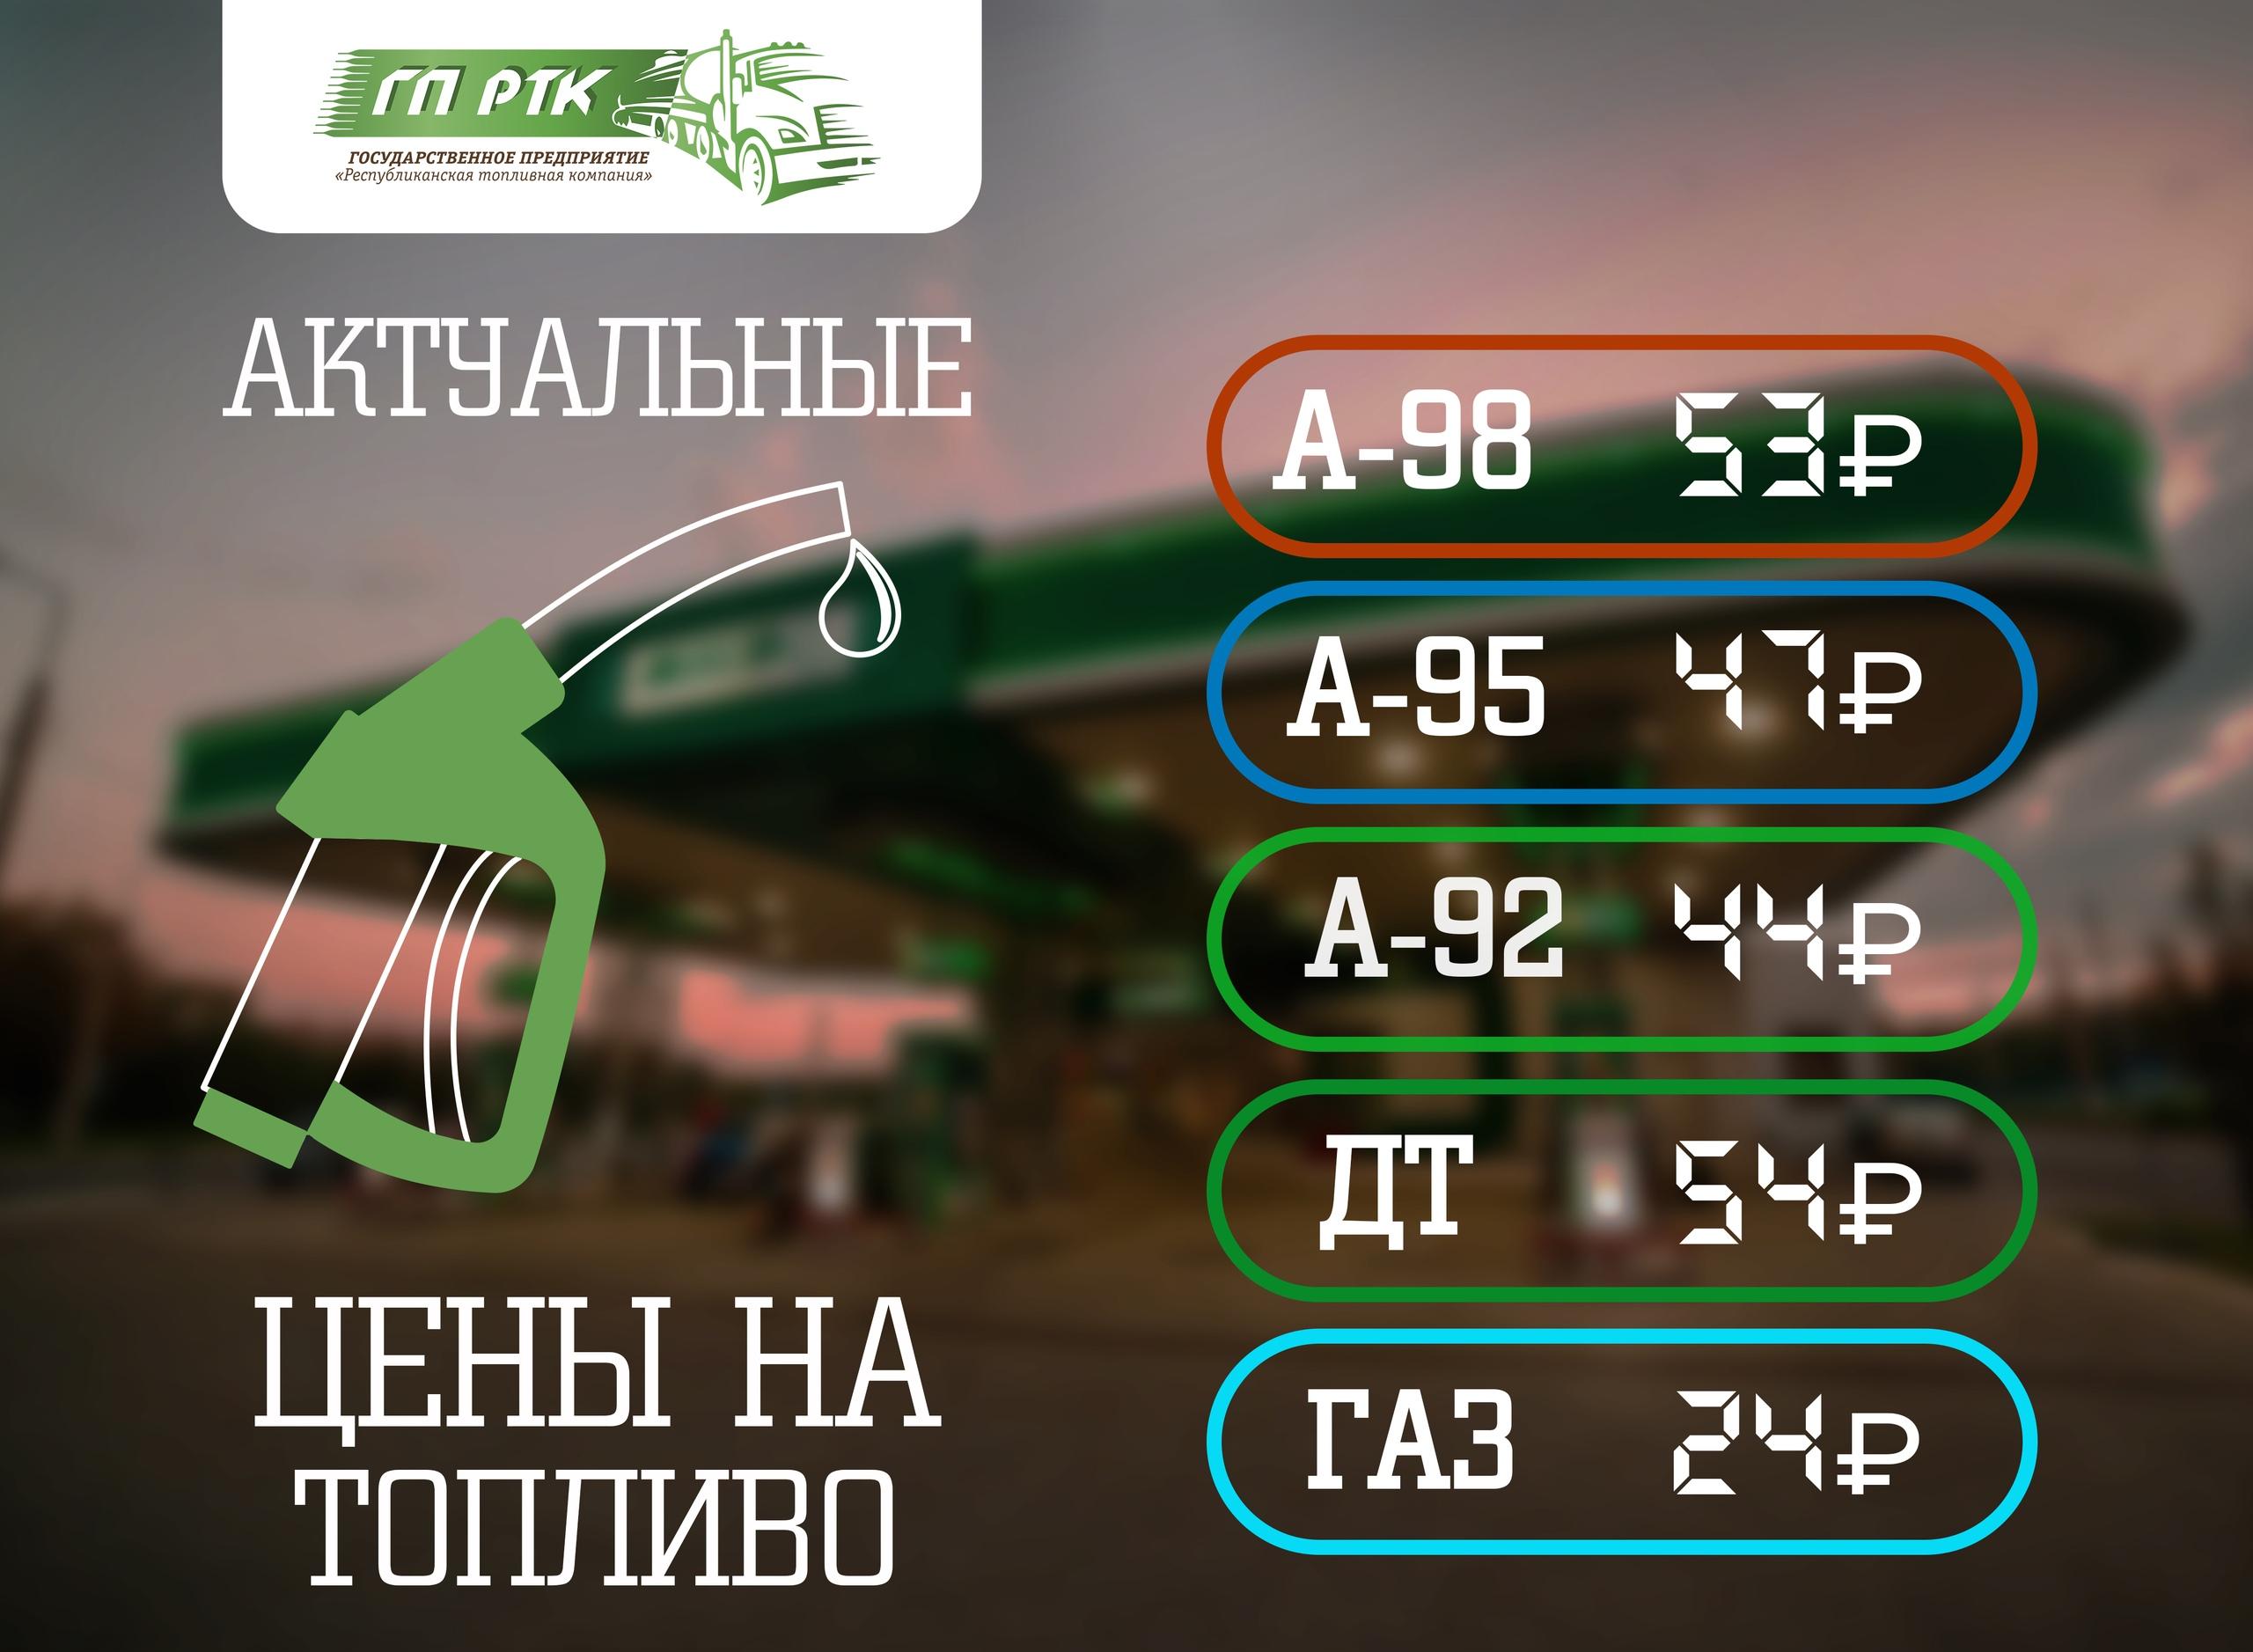 На заправках ГП «РТК» изменилась цена на топливо